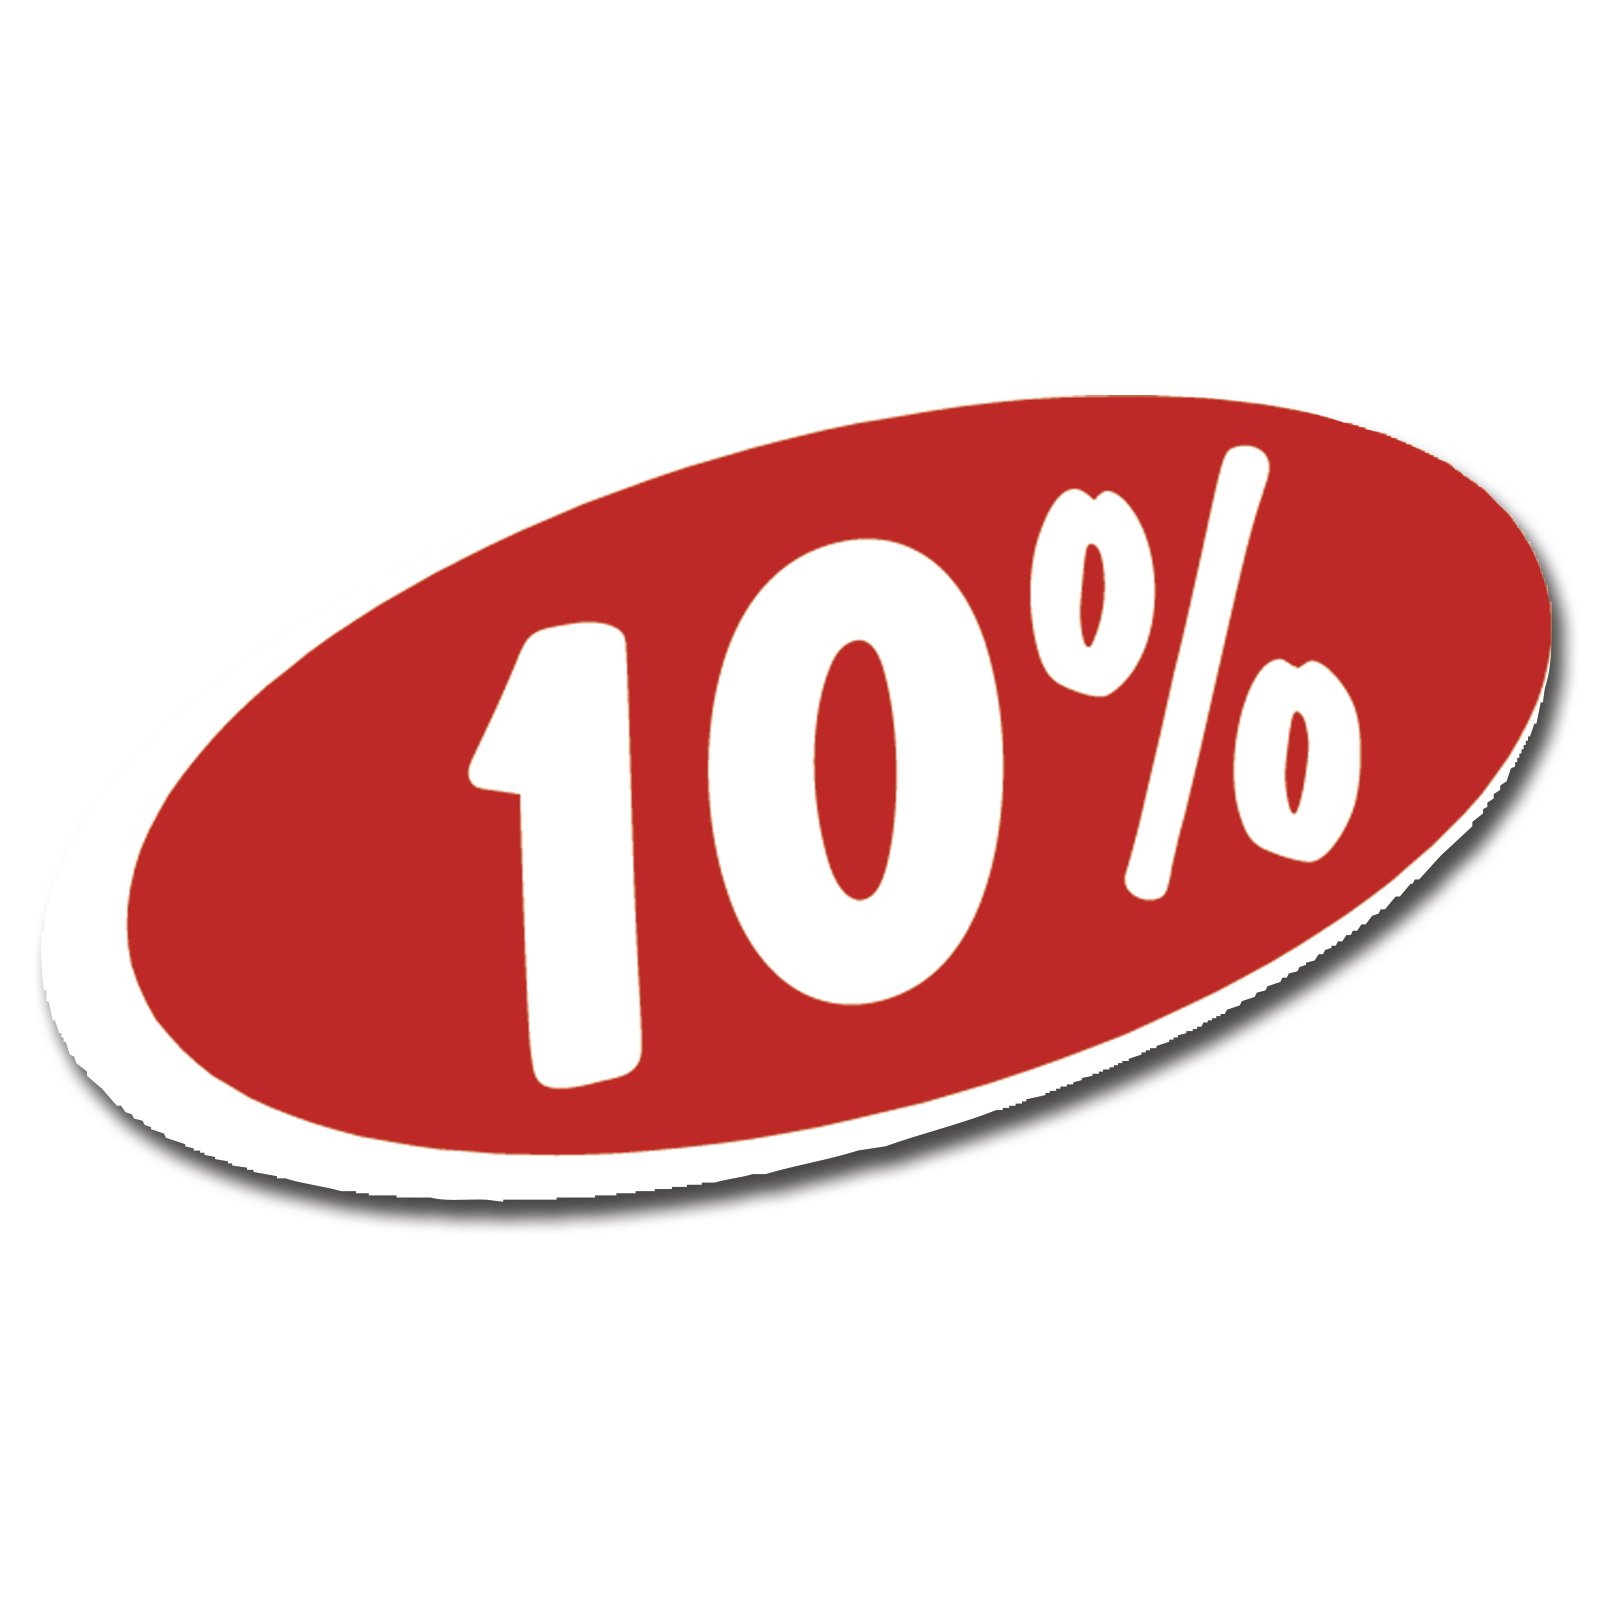 Rotes Oval Selbstkleb Ankleber Reduziert Sale